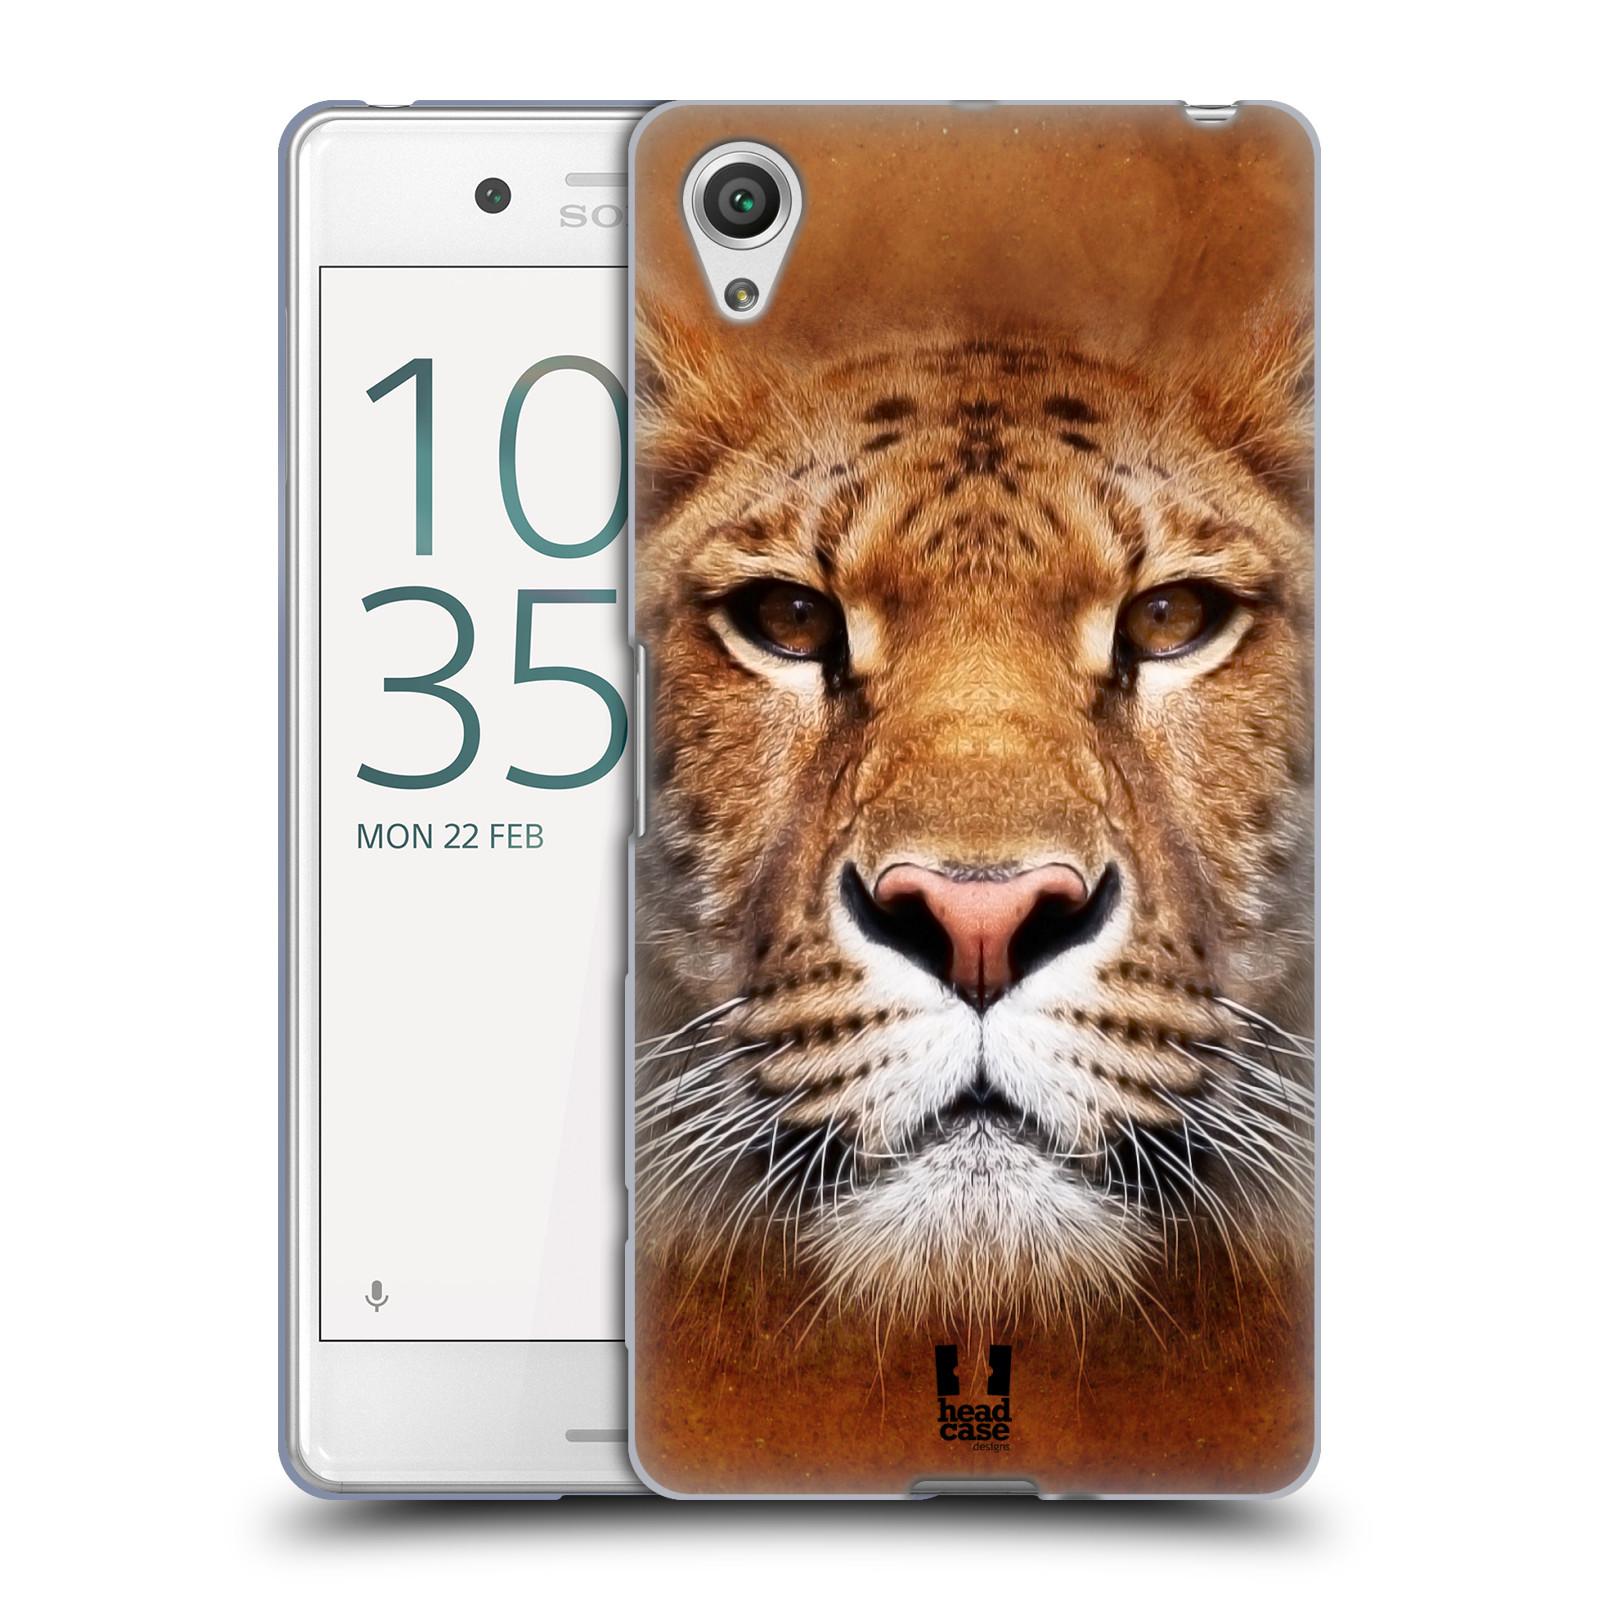 HEAD CASE silikonový obal na mobil Sony Xperia X PERFORMANCE (F8131, F8132) vzor Zvířecí tváře Sibiřský tygr